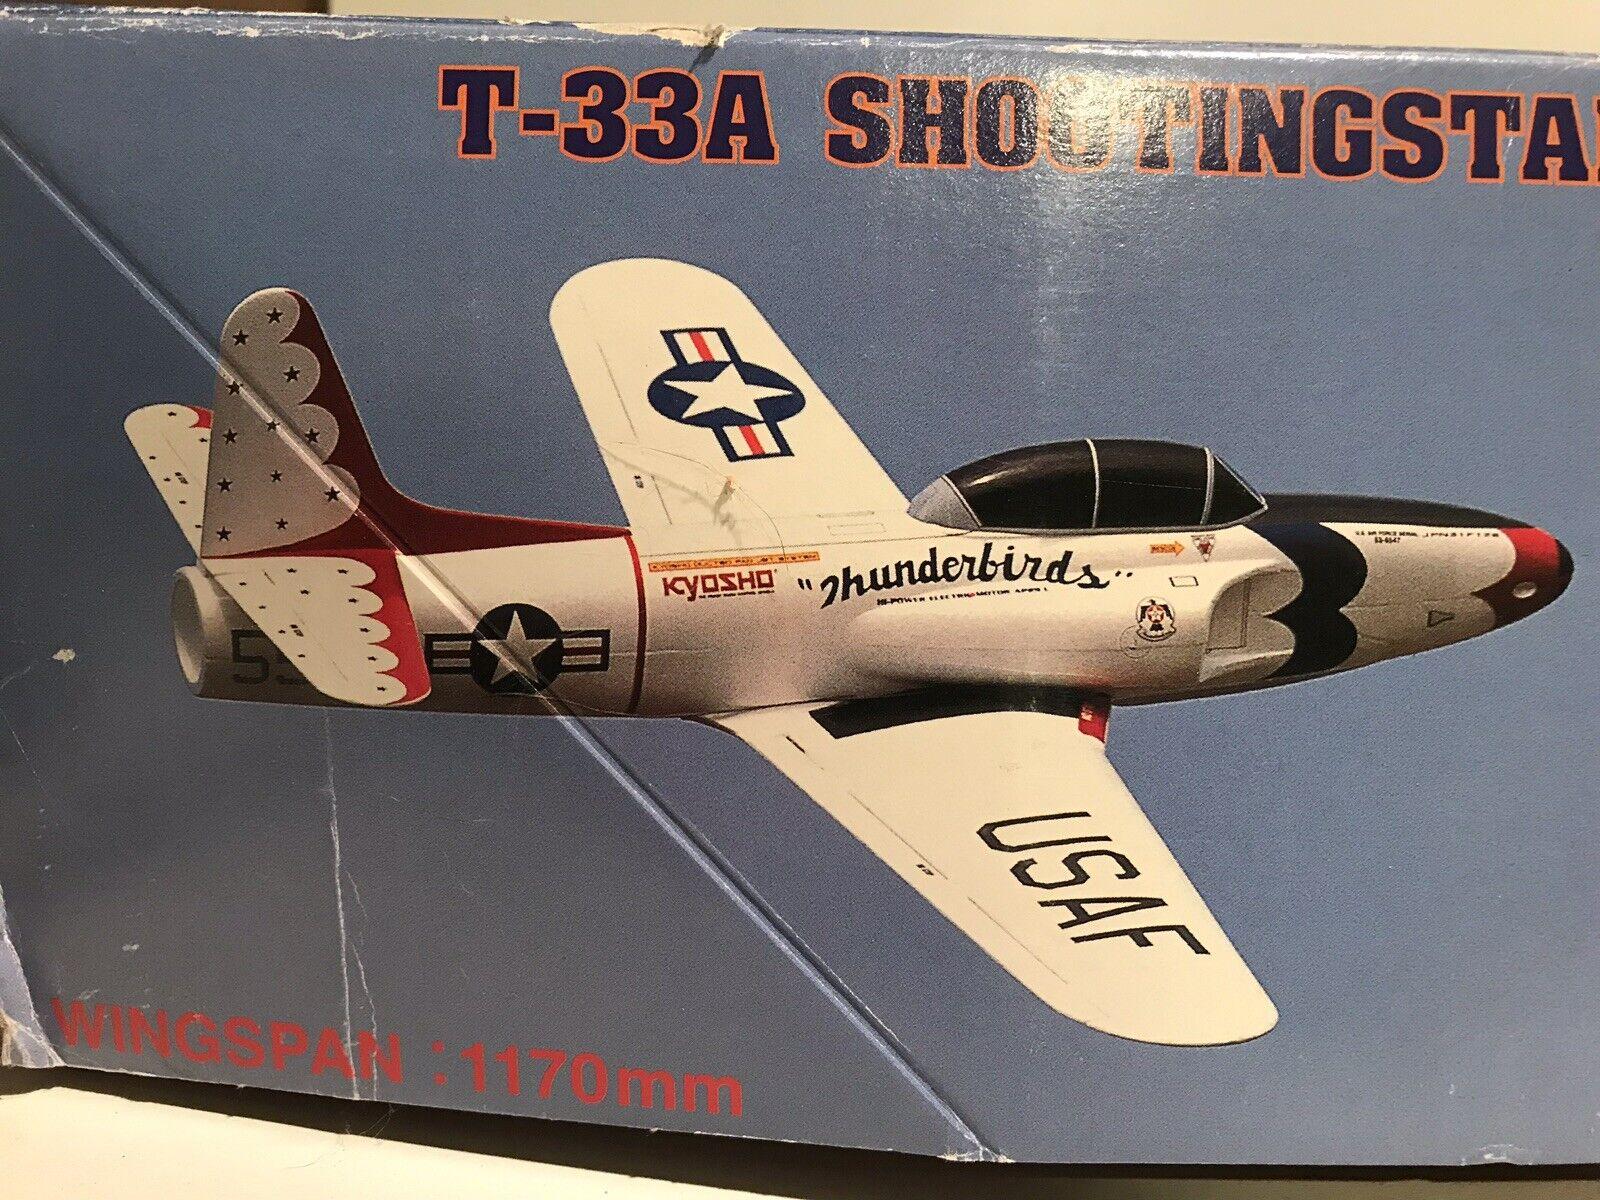 Discontinuado Kyosho Foam Arf T-33 Shooting Star Ducted Fan Jet